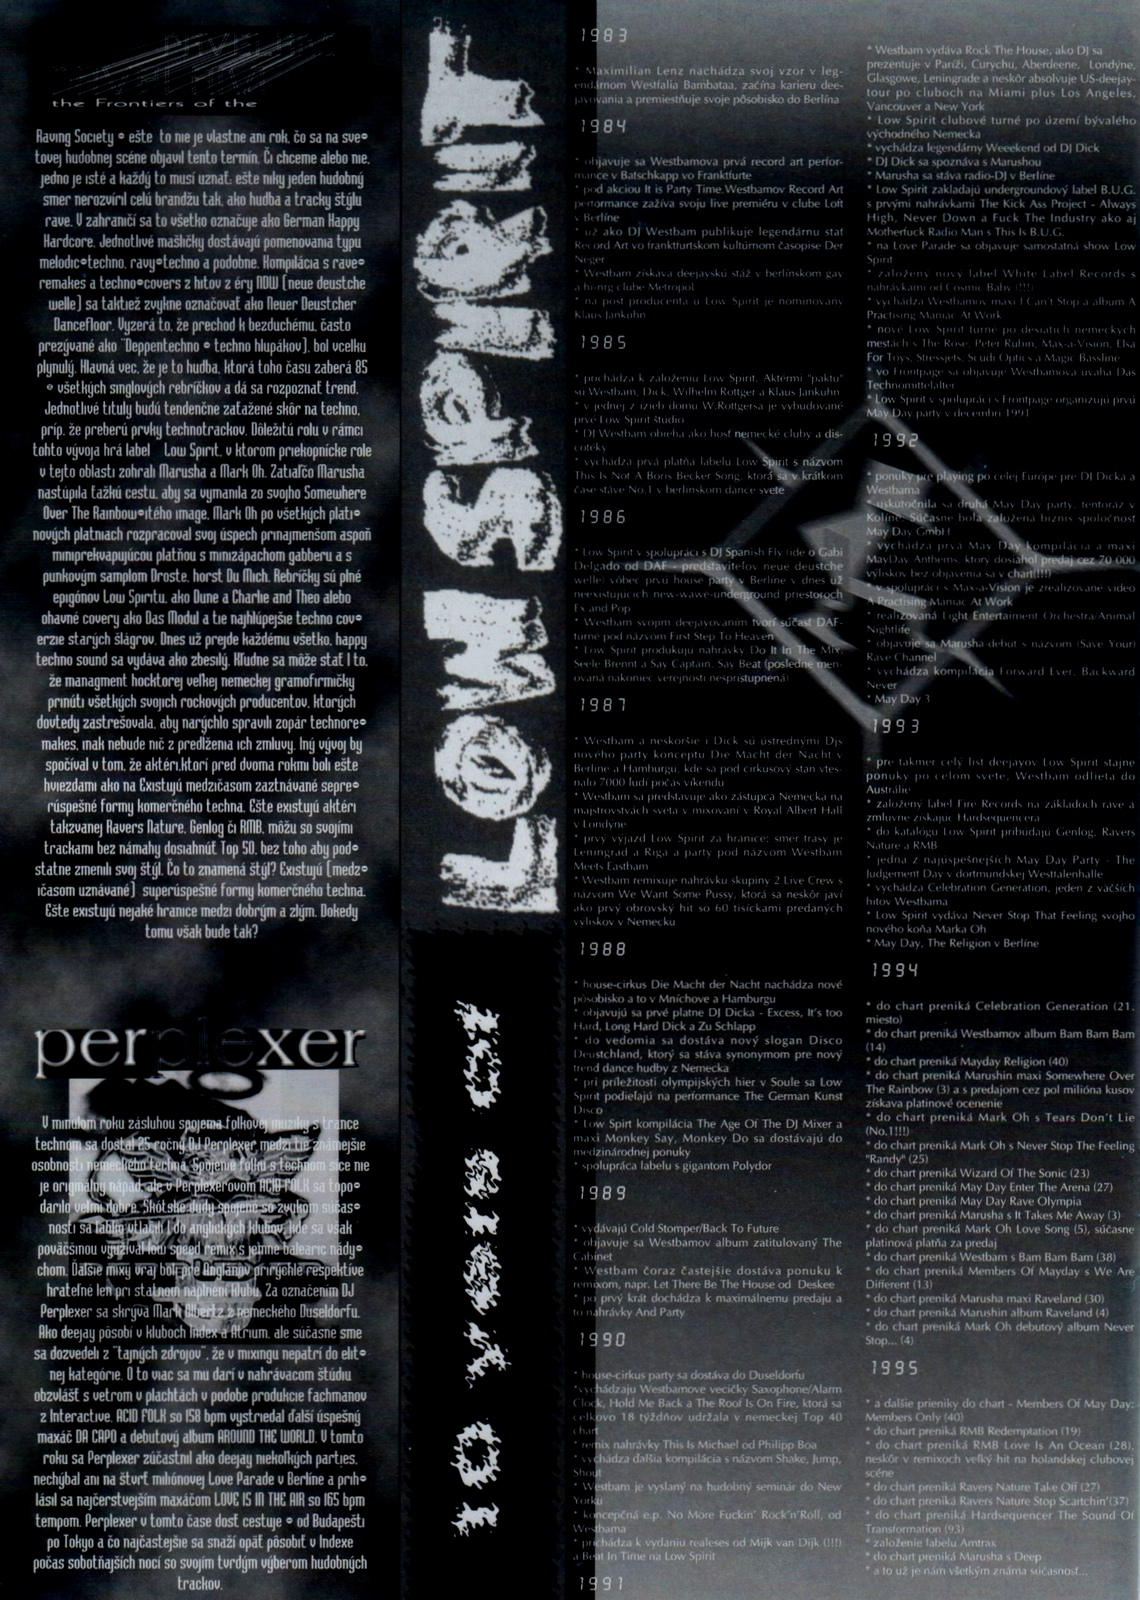 http://4.bp.blogspot.com/-ZhJPMJpaTM0/T5iNDAE1FwI/AAAAAAAEAFE/OlKrGWQgrdk/s1600/07%2BMusic%2BPower.jpg